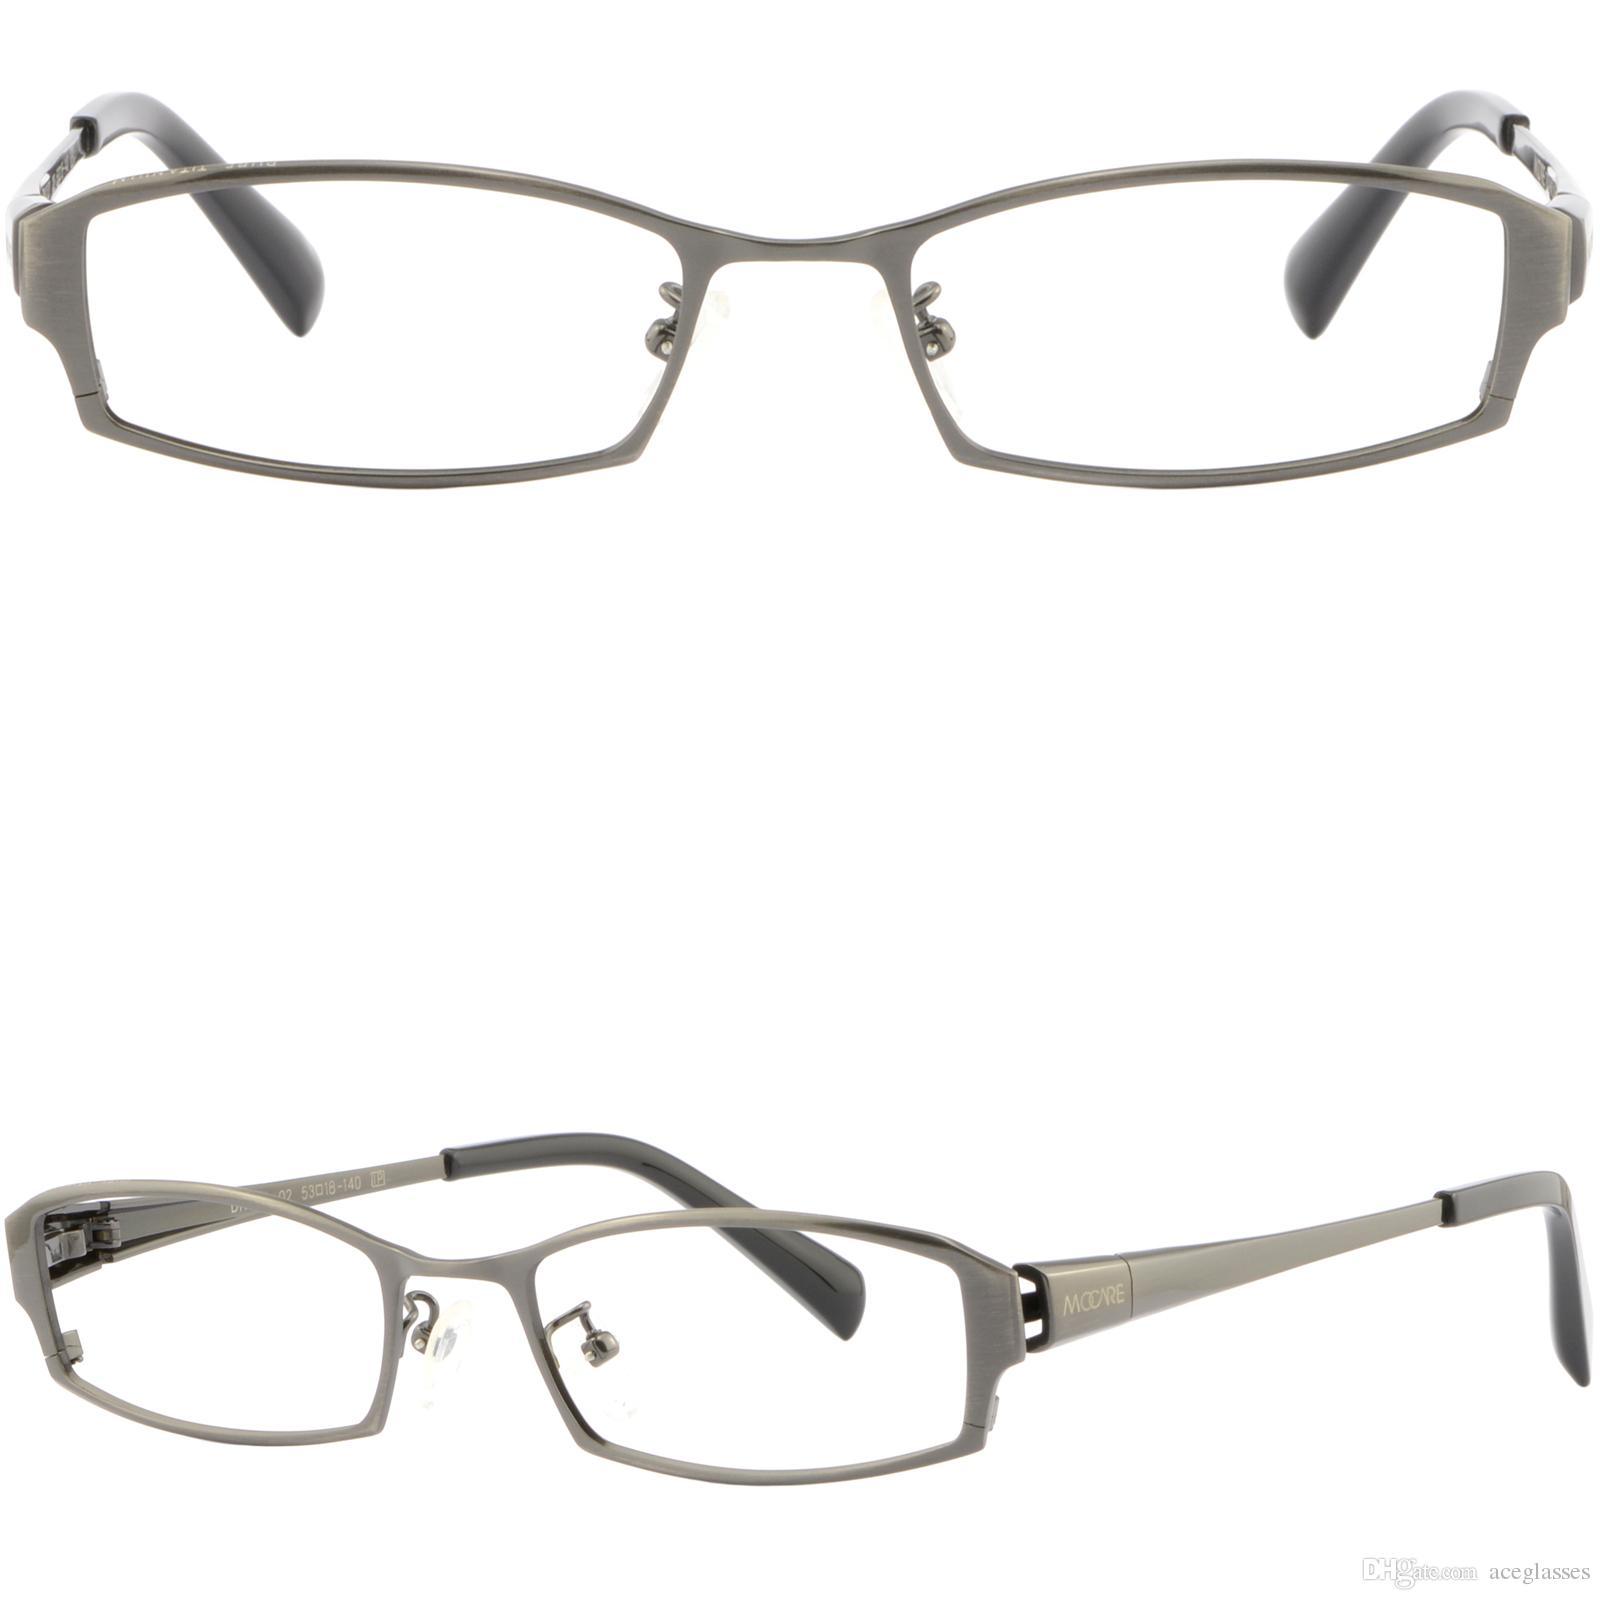 ce4e990b8109 Mens Womens Metal Titanium Frames Small Metallic Prescription Glasses Gray  Grey Eyeglasses Frame Eyewear Frames From Aceglasses